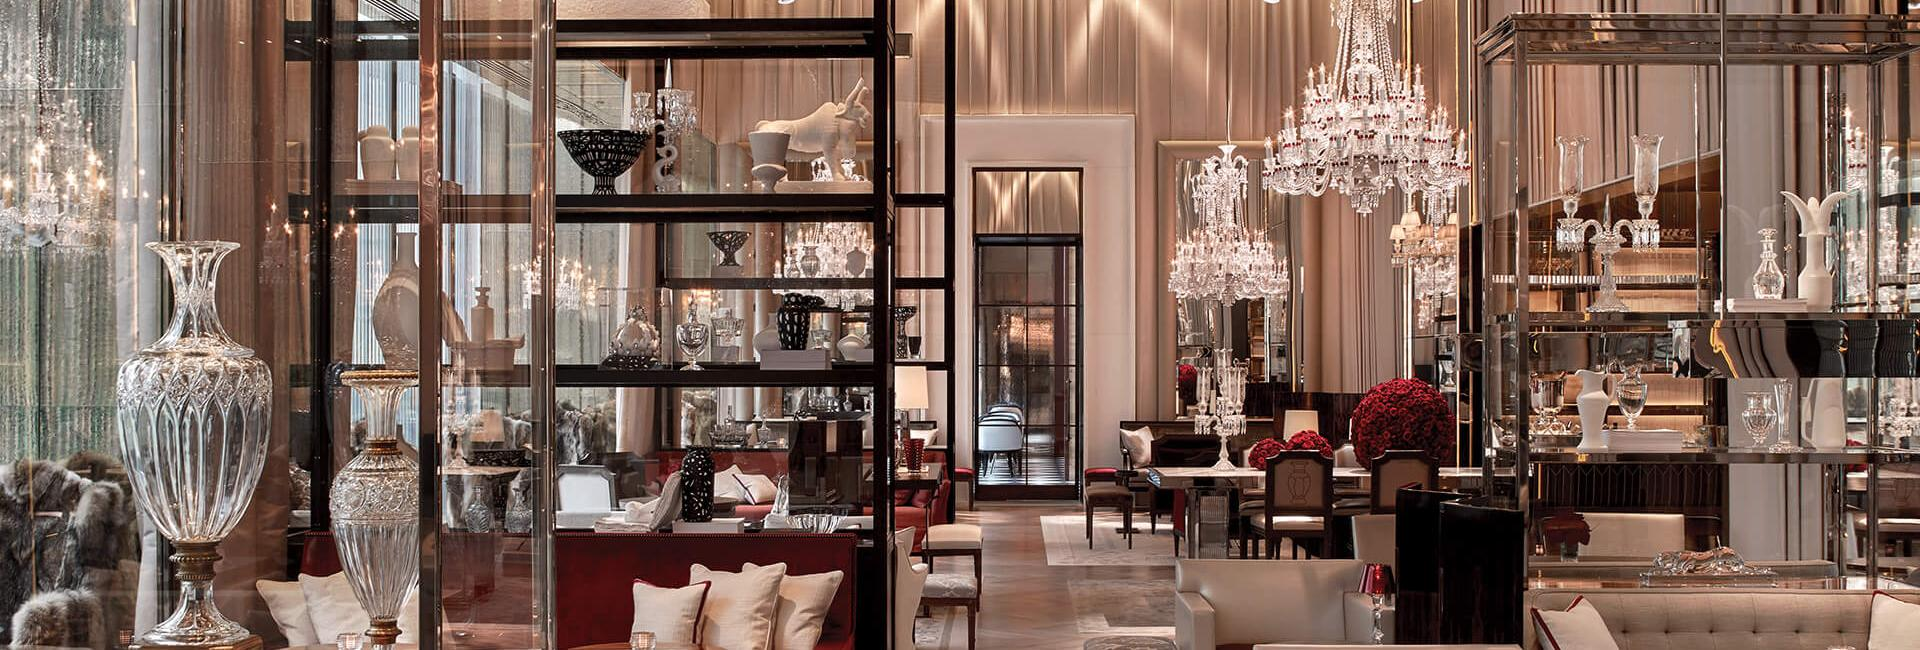 The Grand Salon at Baccarat Hotel